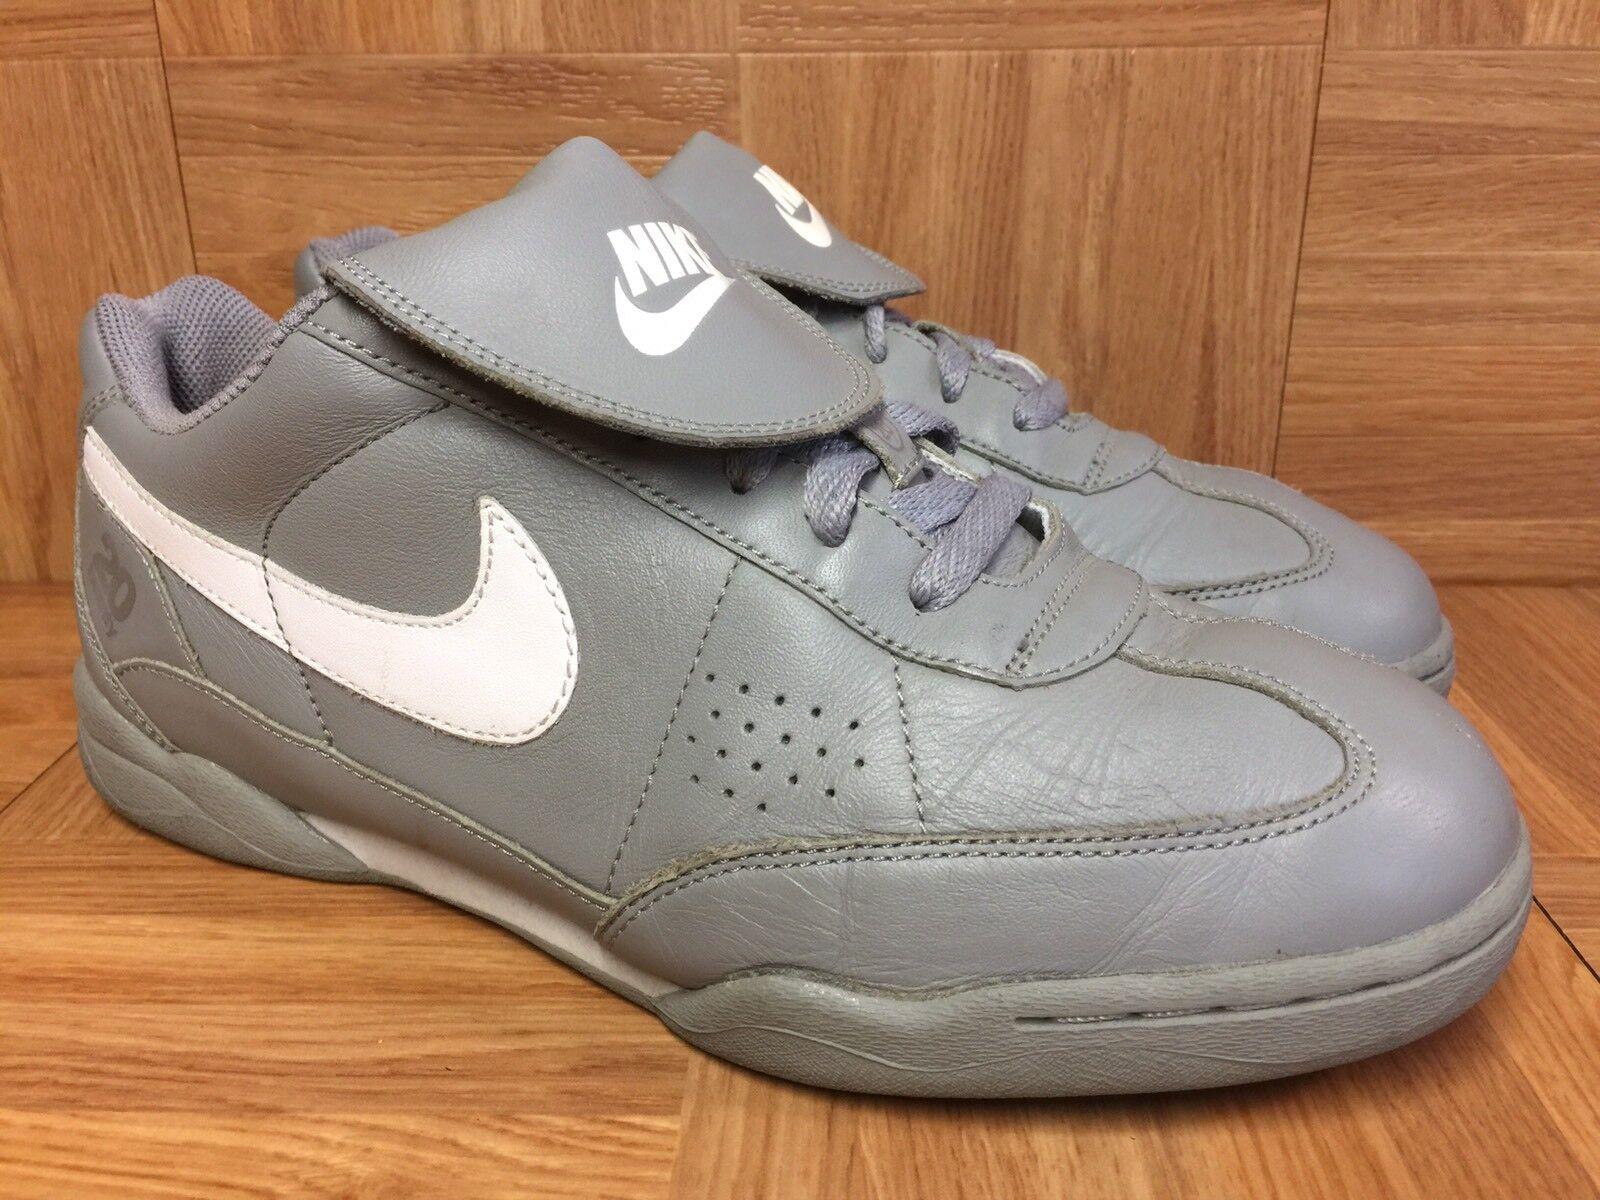 Vntg nike 20 pelle / 20 vintage in pelle 20 grigia scarpe sz 9 2004 scarpe da uomo 221b8b